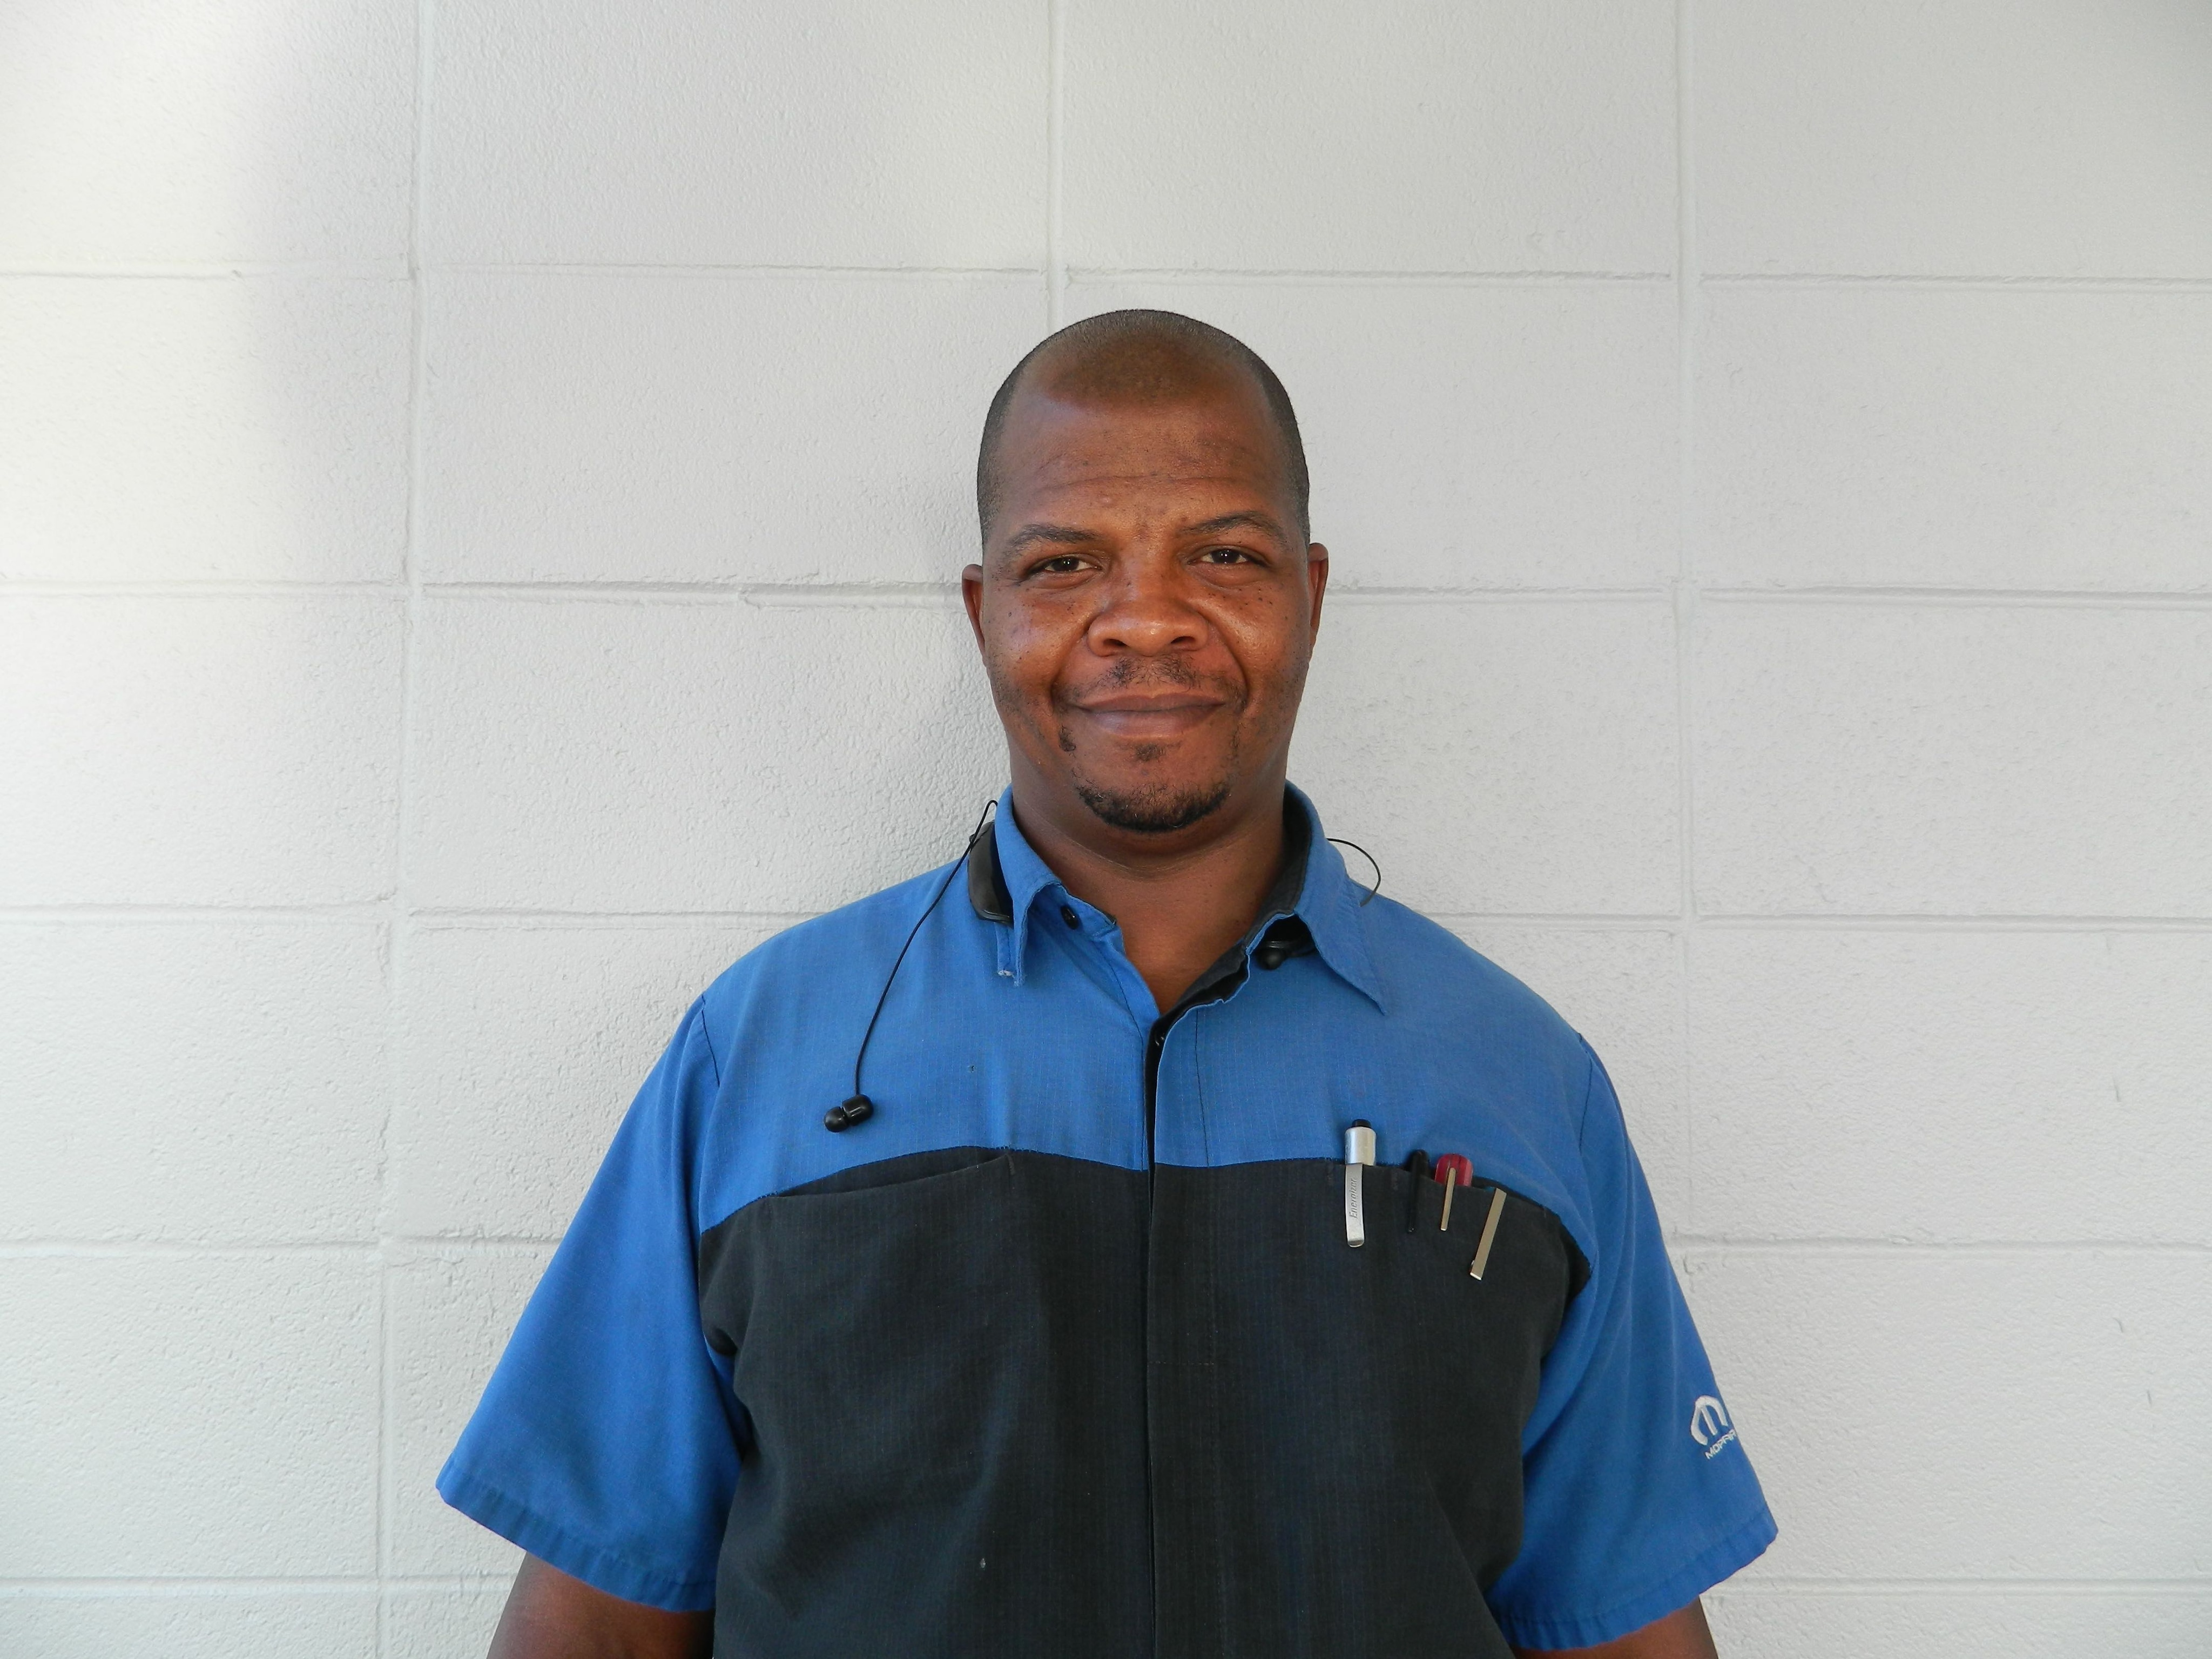 Staff Jeff Wilson Cdjr Brookhaven Amp Jackson Ms